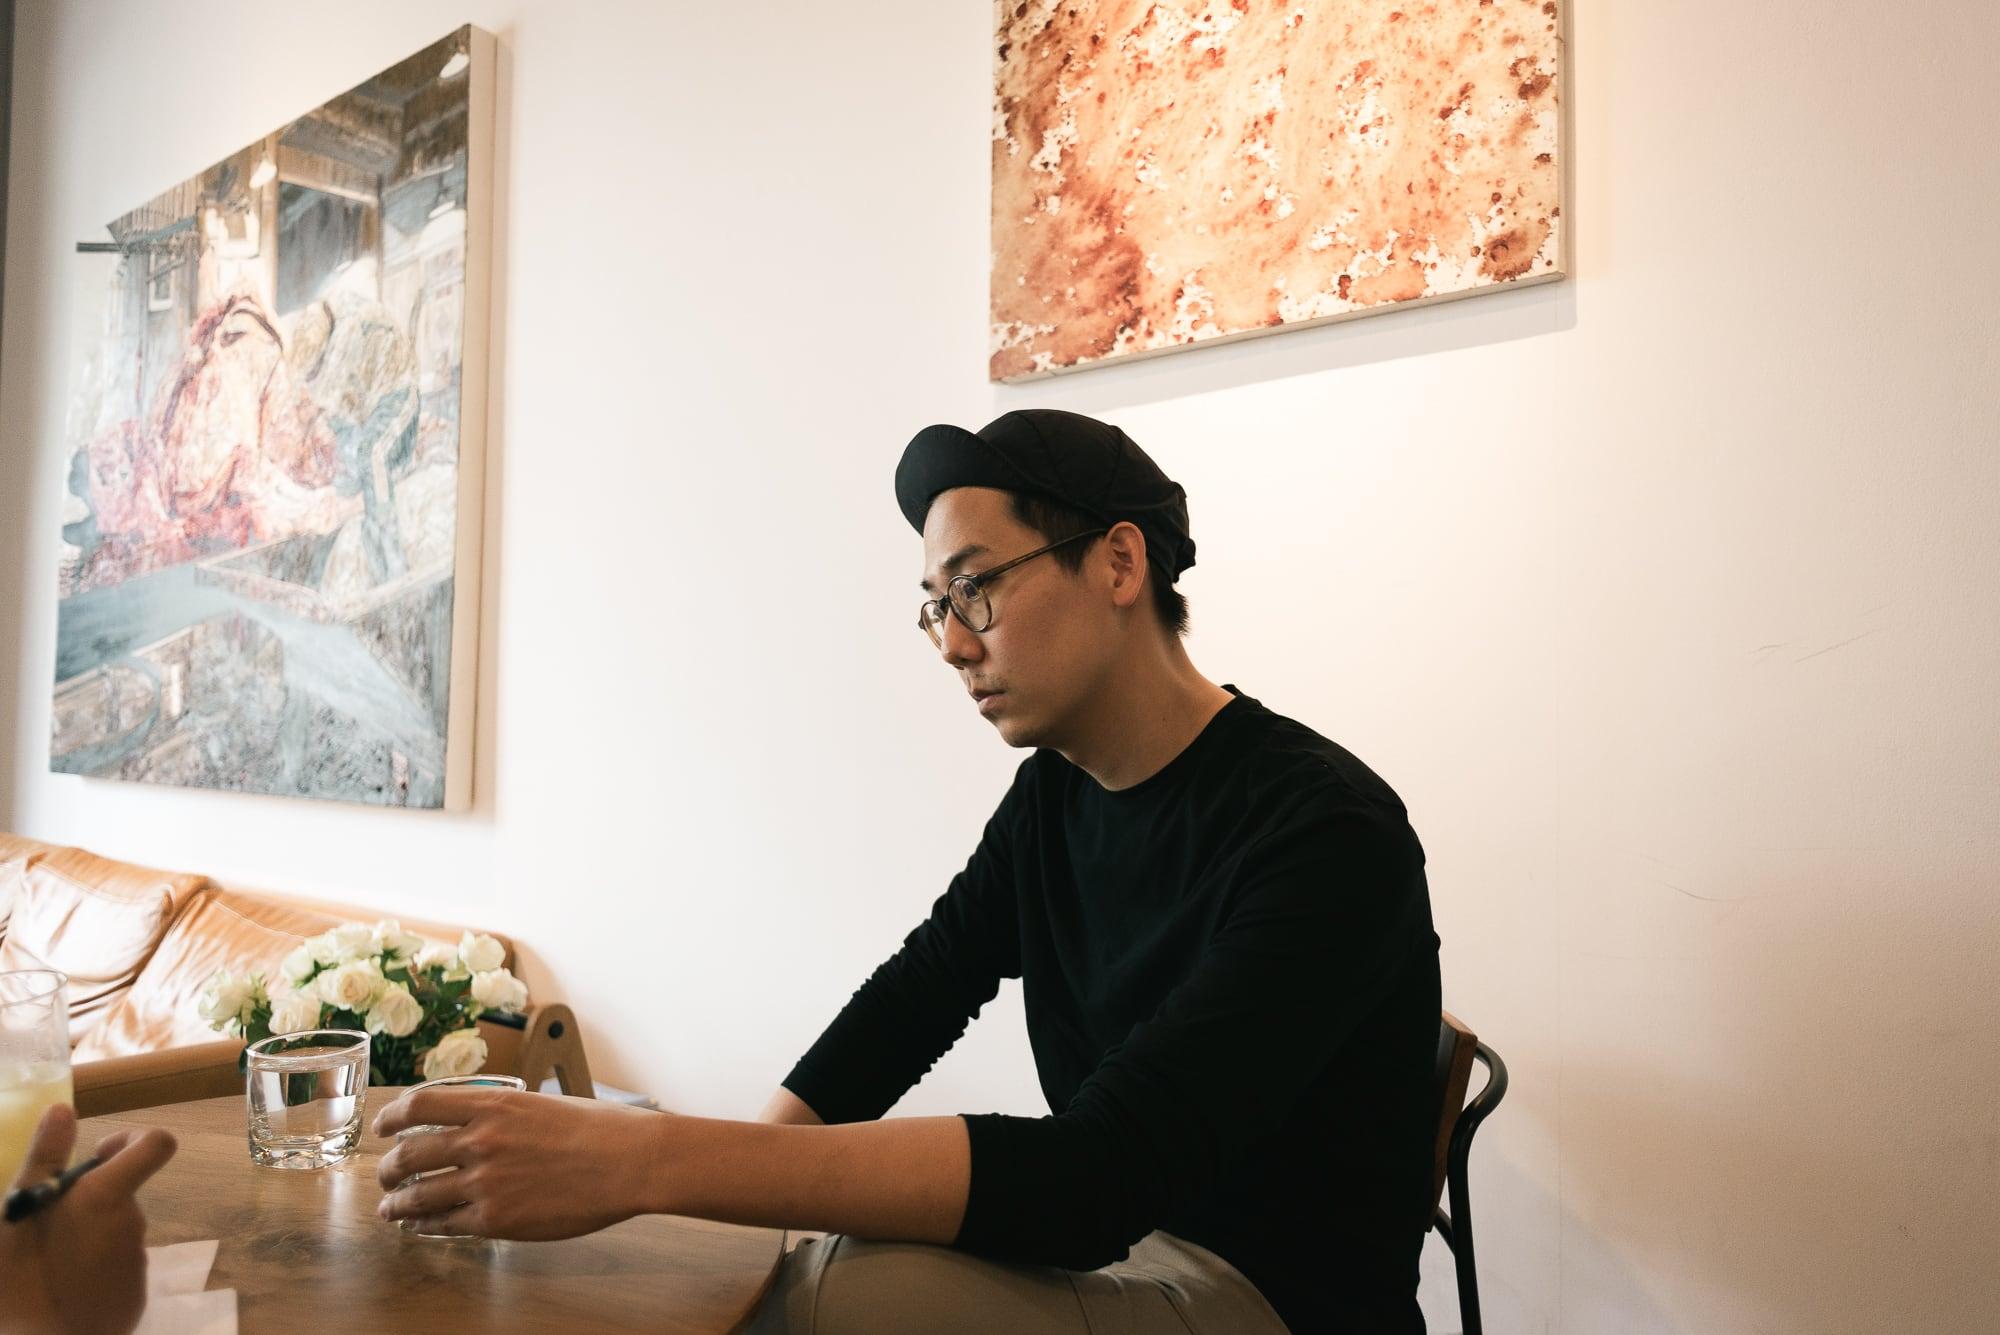 Vu Hoang Anh